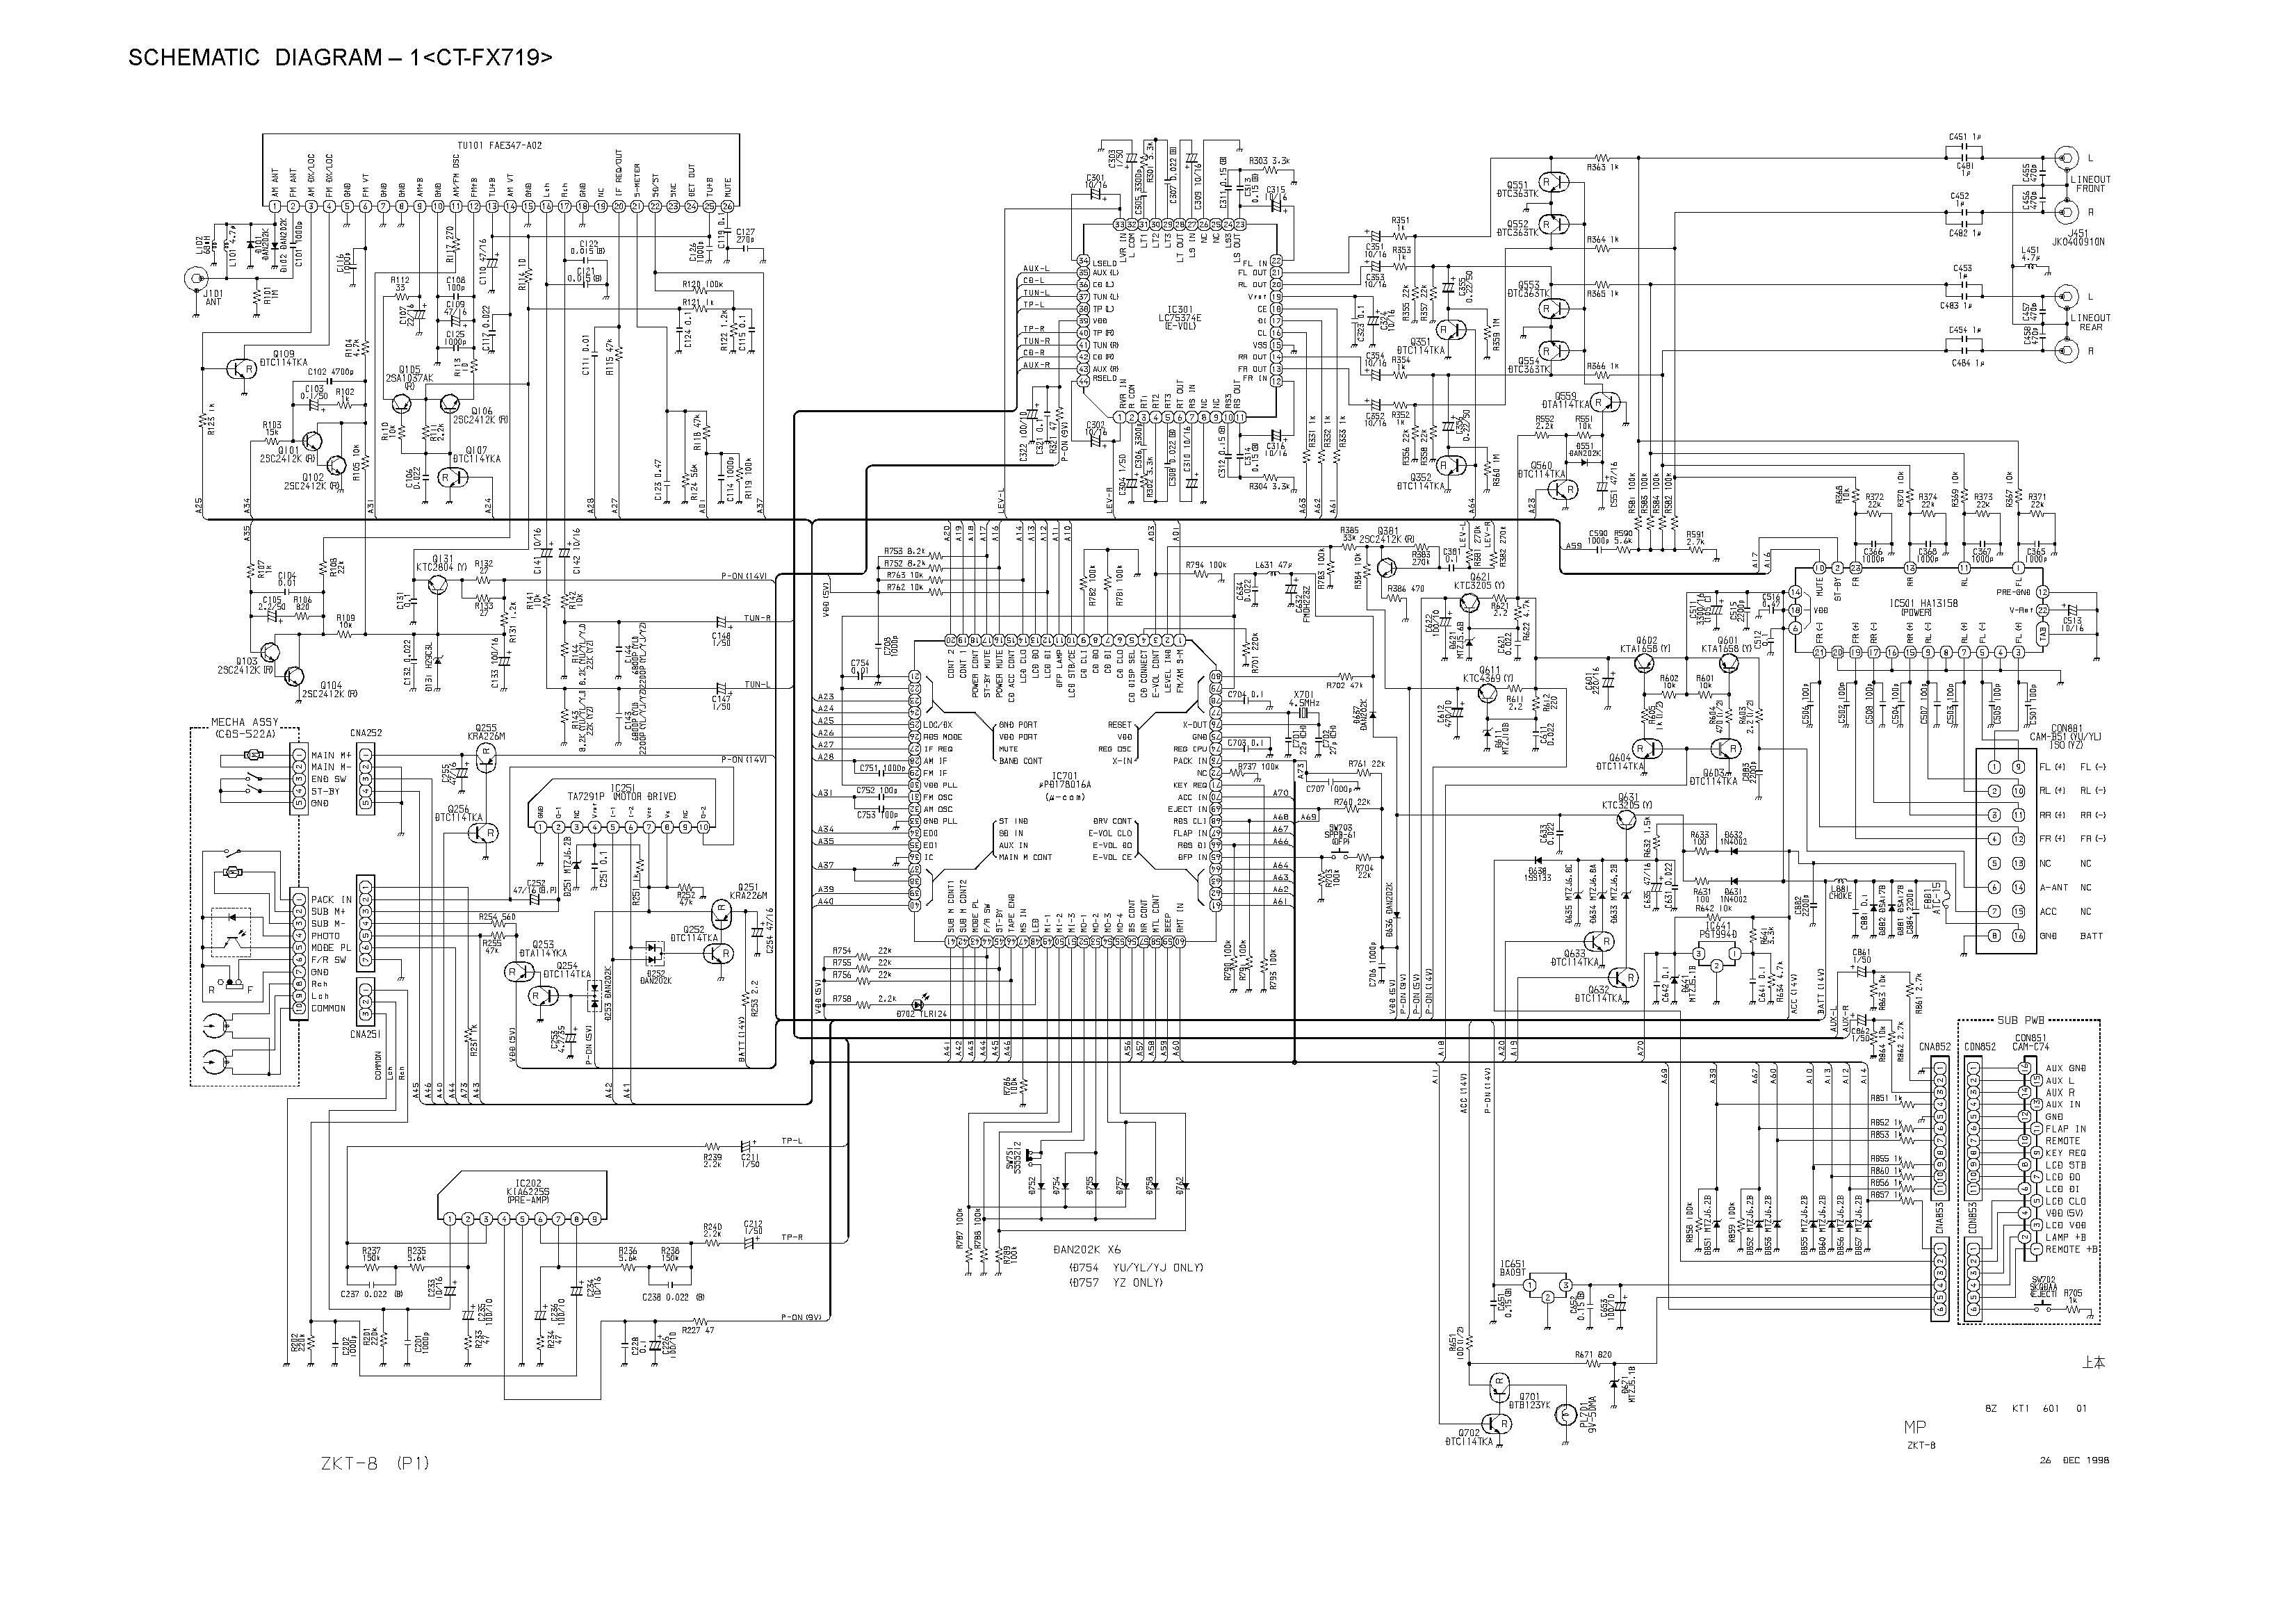 aiwa ct-fx719 schematic diagram  main    front  in pdf format